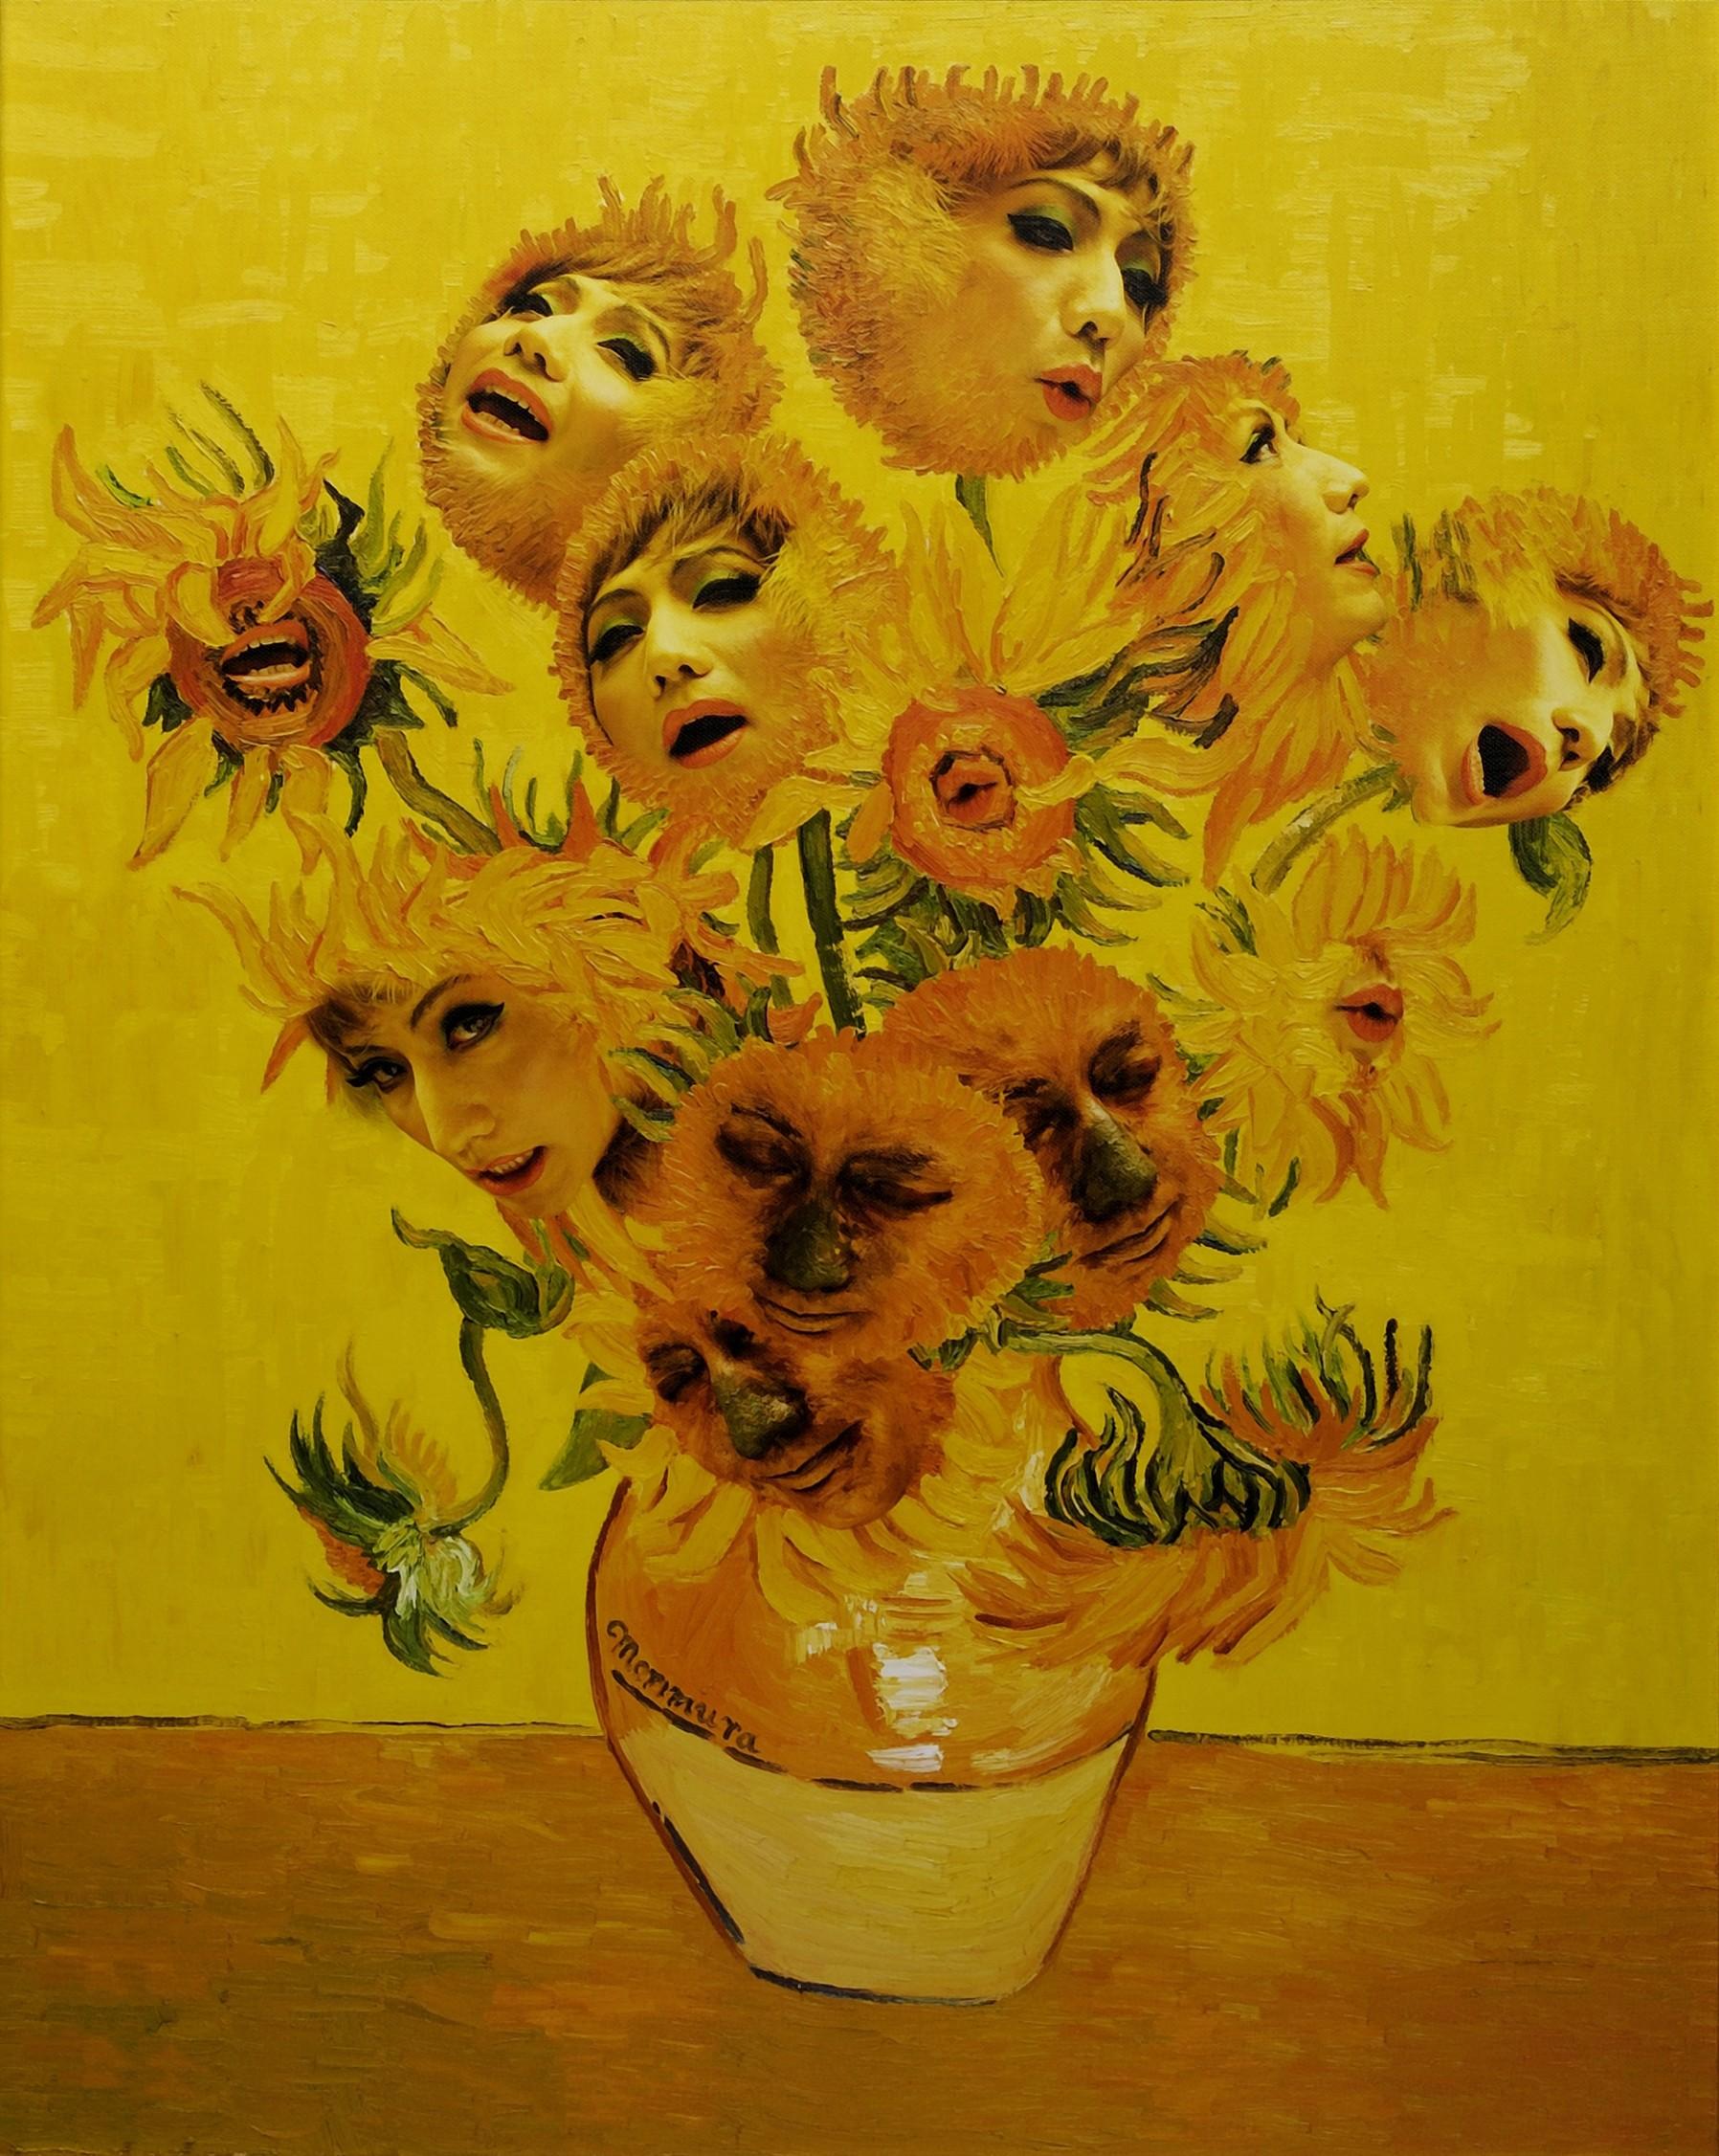 Yasuma Morimura - Singing Sunflowers (1998)